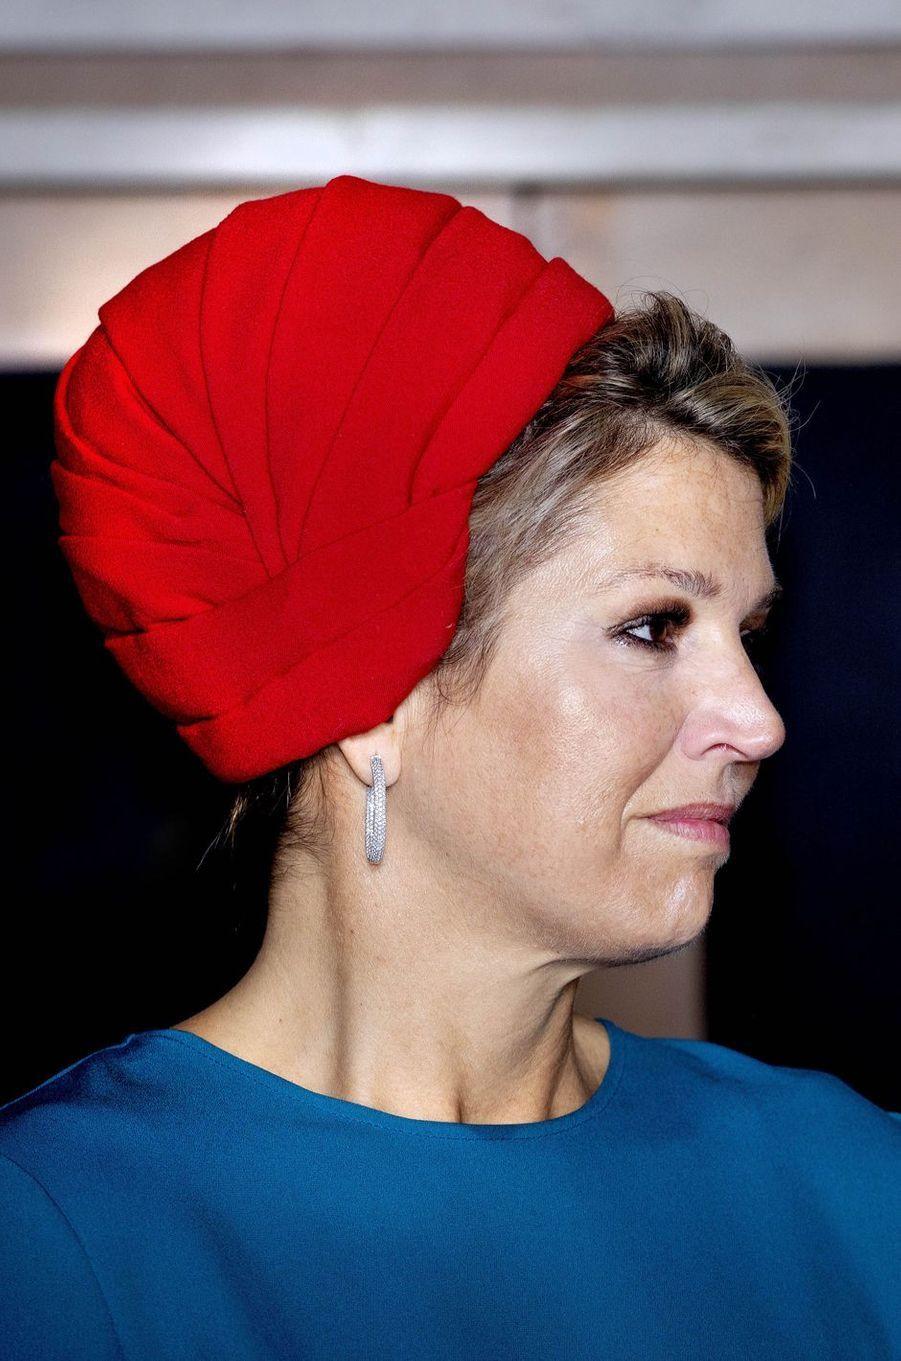 Le turban de la reine Maxima des Pays-Bas en Zélande, le 16 octobre 2018